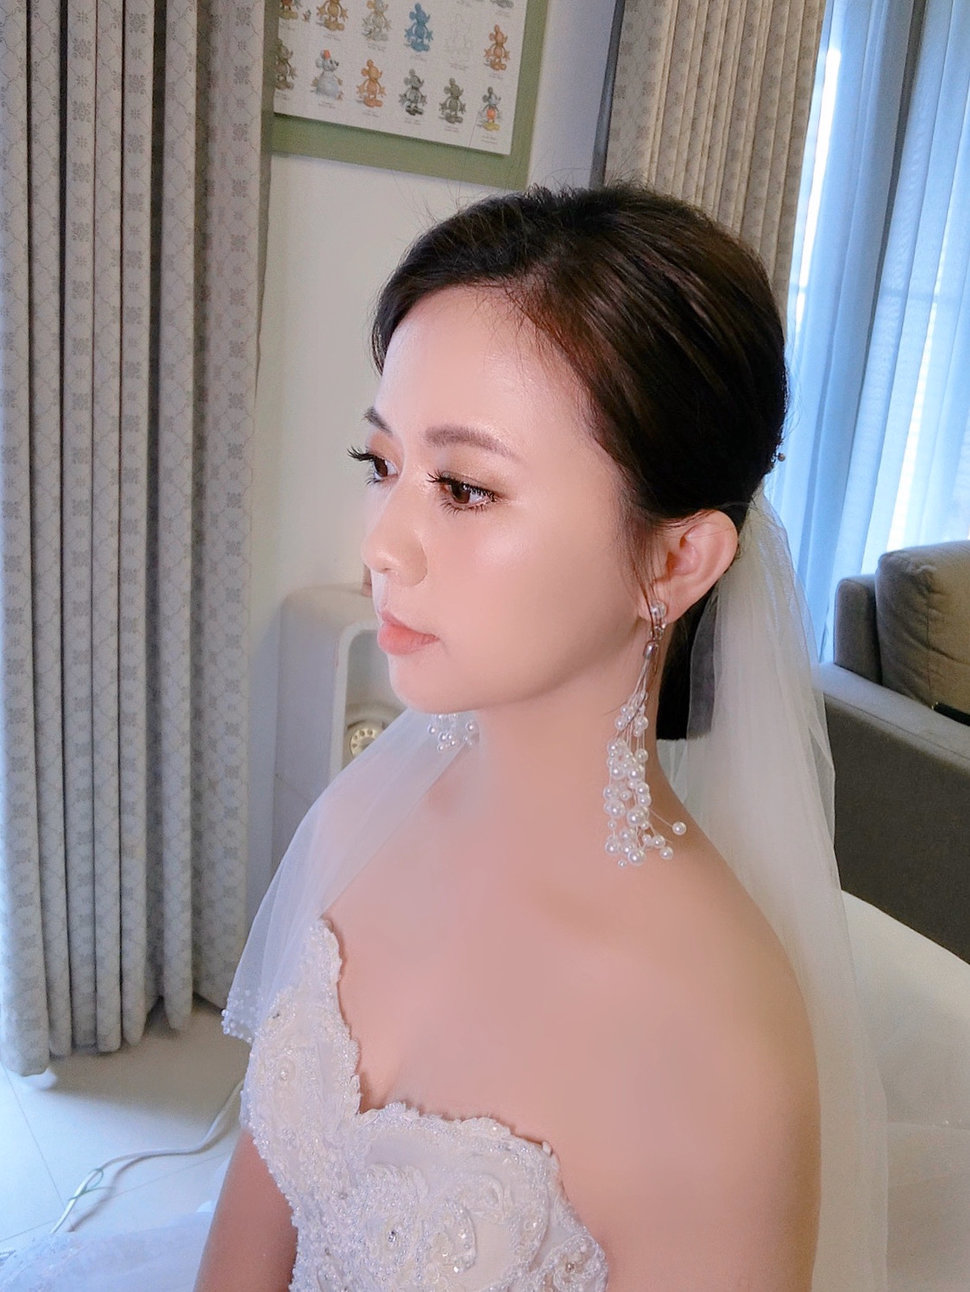 401E7A8C-D3DA-4D86-998B-01B09A057383 - Ellen wang stylist《結婚吧》